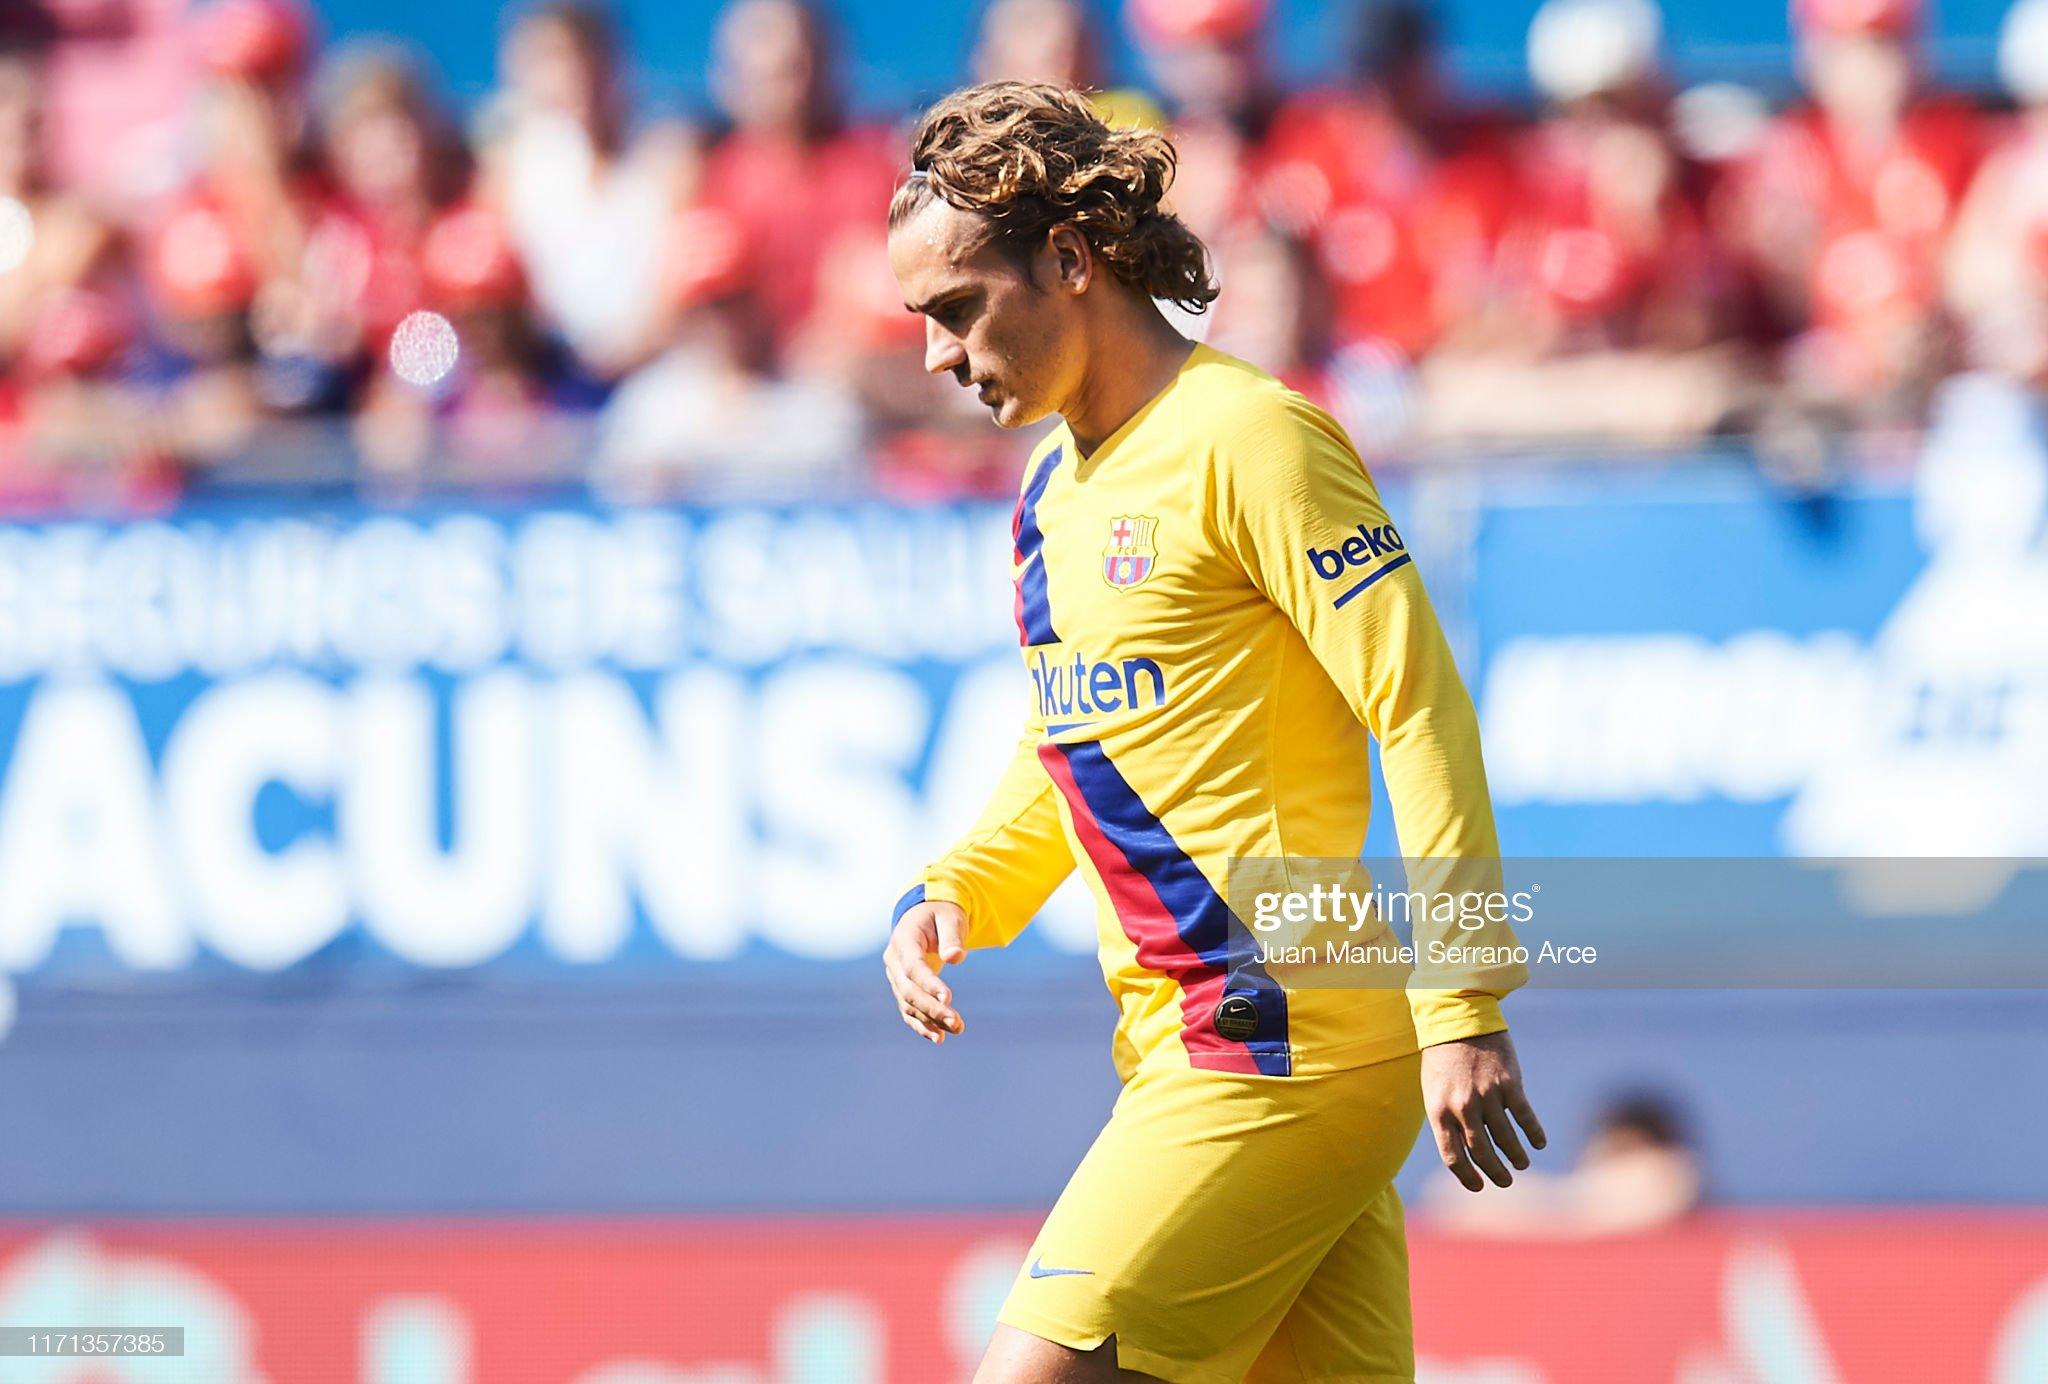 صور مباراة : أوساسونا - برشلونة 2-2 ( 31-08-2019 )  Antoine-griezmann-of-fc-barcelona-looks-on-during-the-liga-match-ca-picture-id1171357385?s=2048x2048